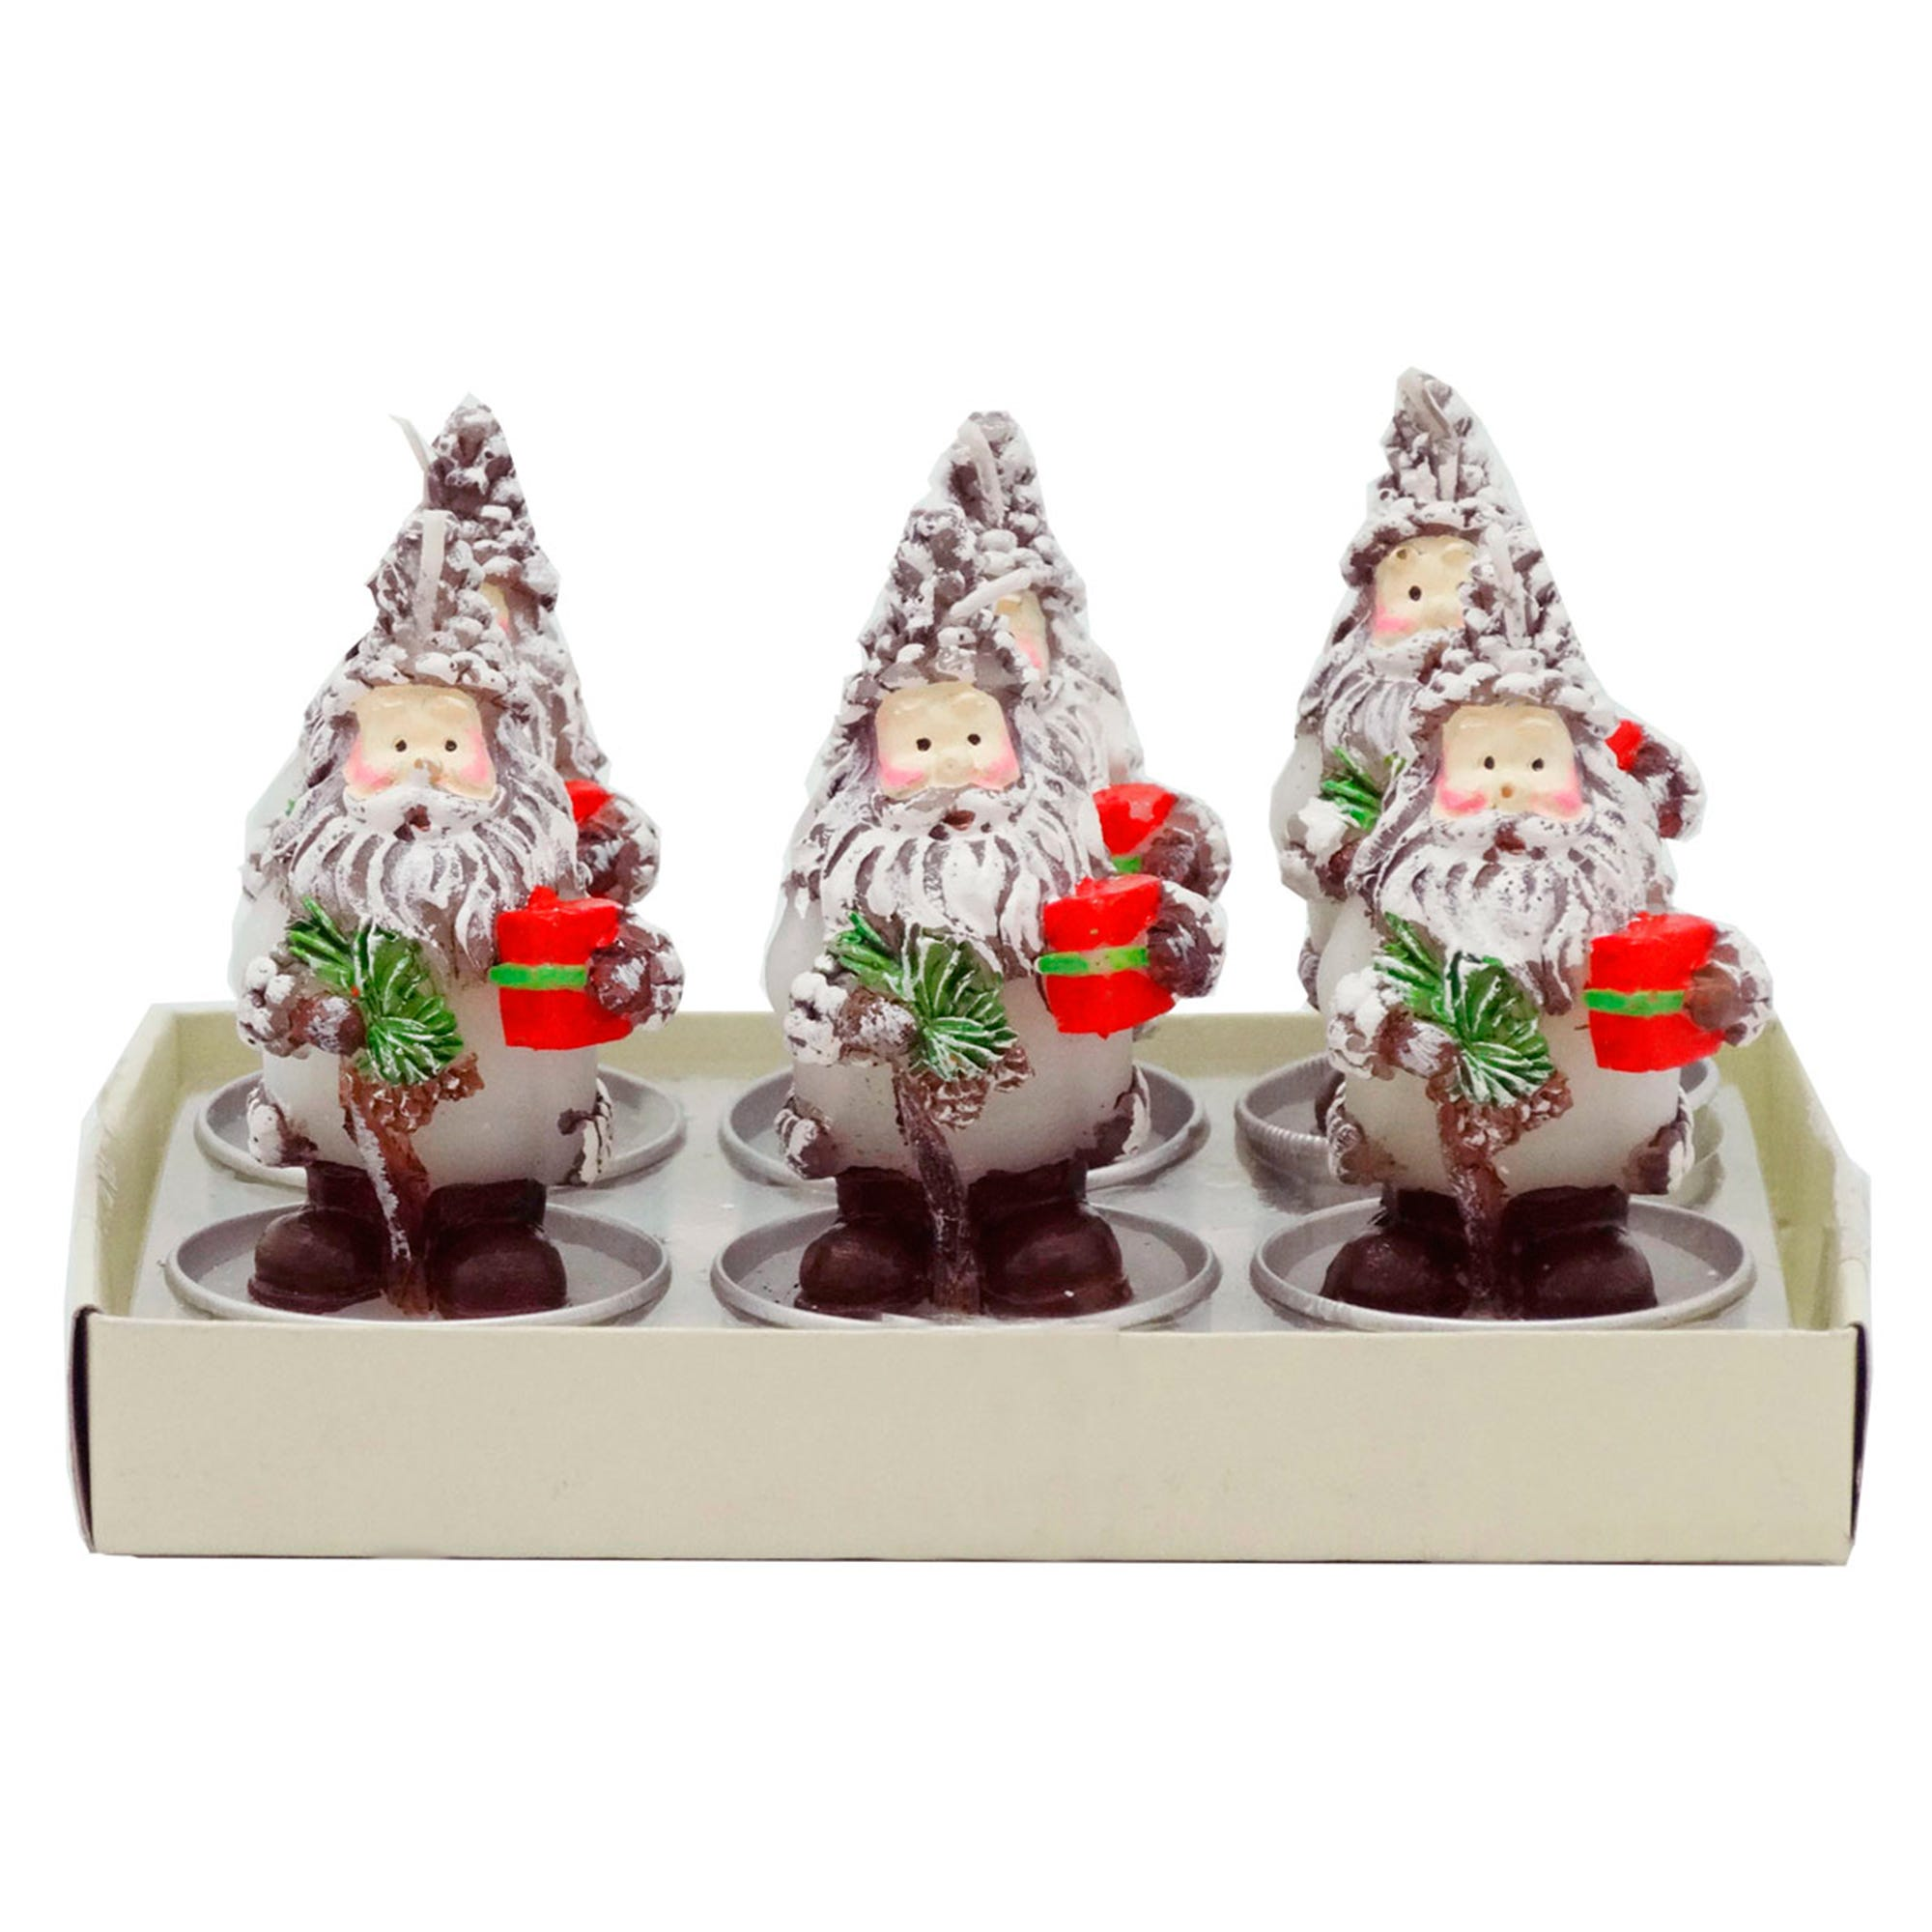 Velas navideñas Running Decora en forma de Santa, Set de 6